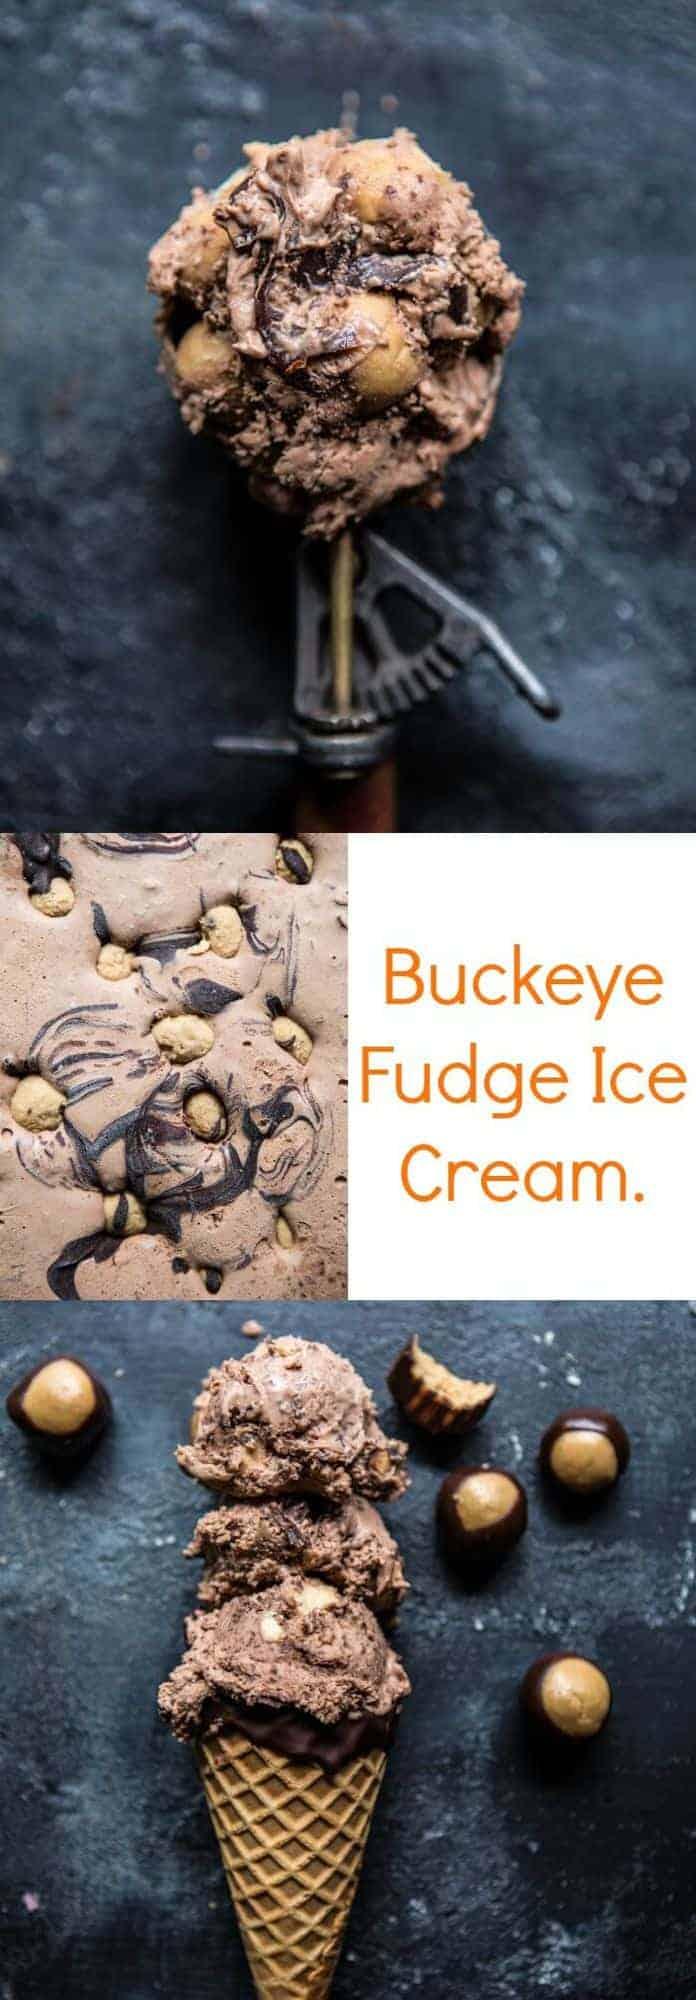 Buckeye Fudge Ice Cream | halfbakedharvest.com @hbharvest